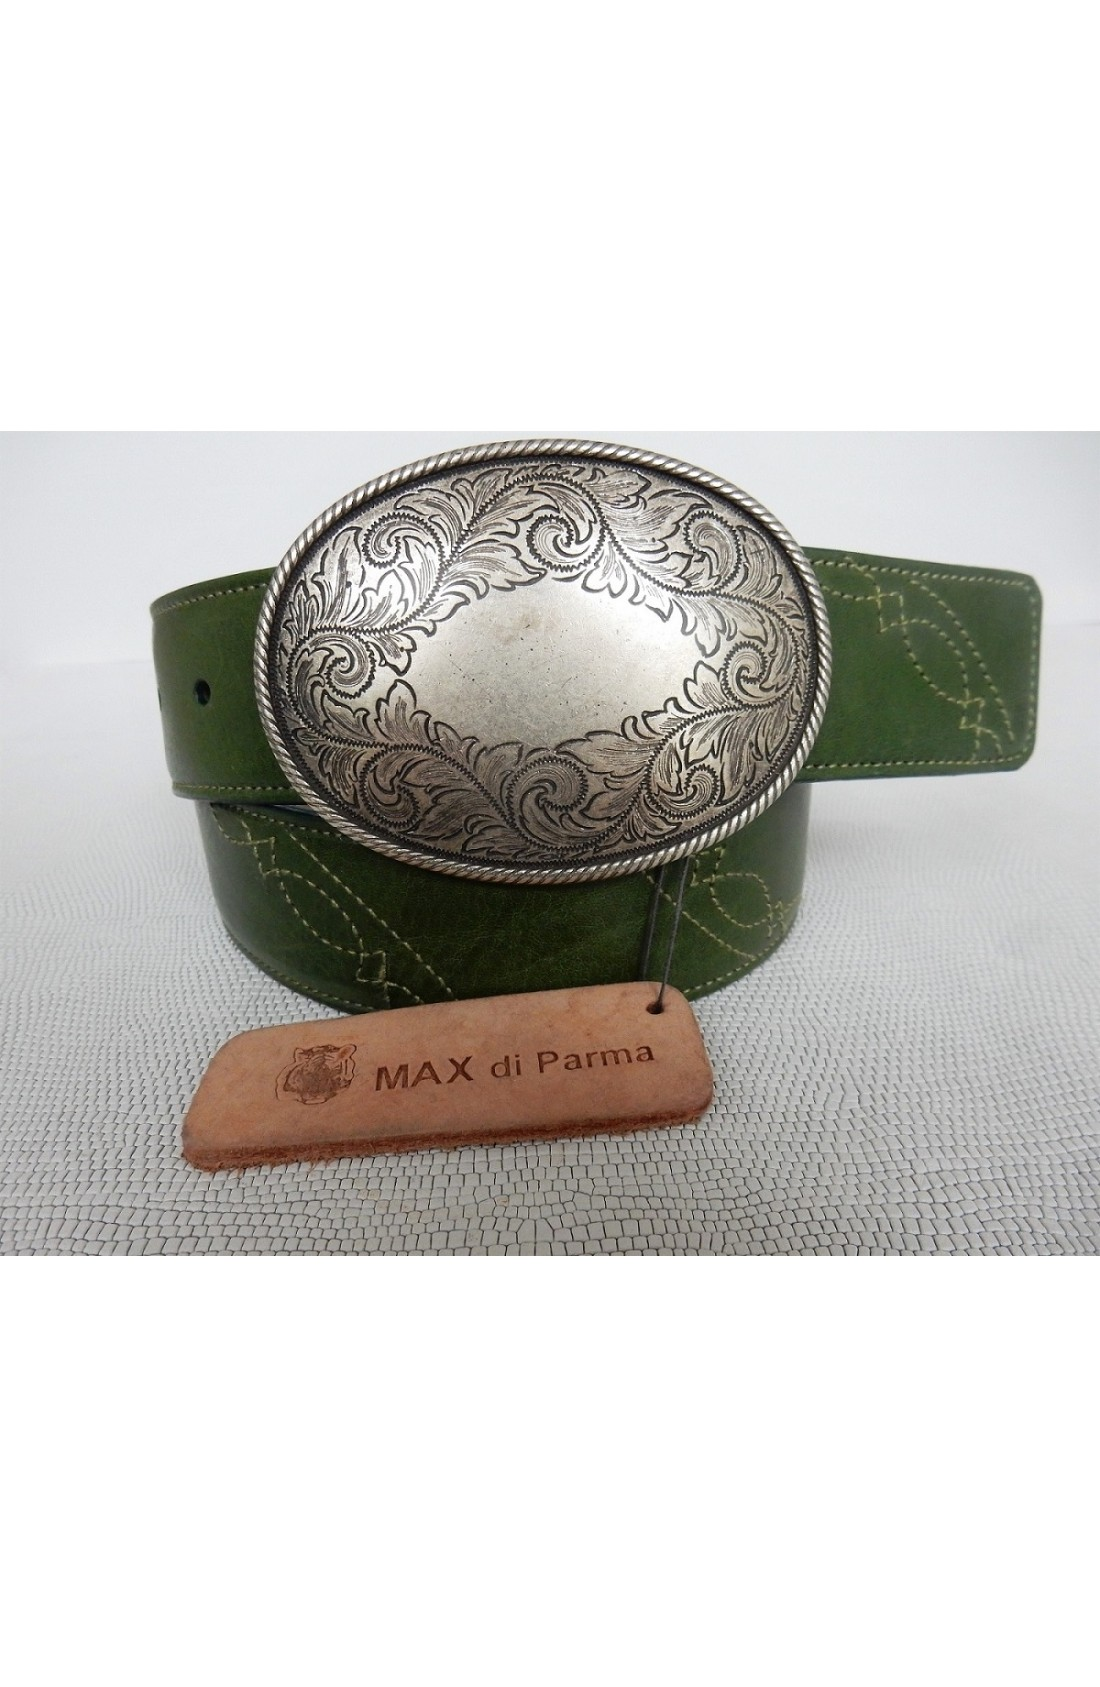 CINTURA SPECIALE art.492 KANSAS su spalle toro mm.40 var.62 verde avocado +cuciture verde in tinta ricamo (1)